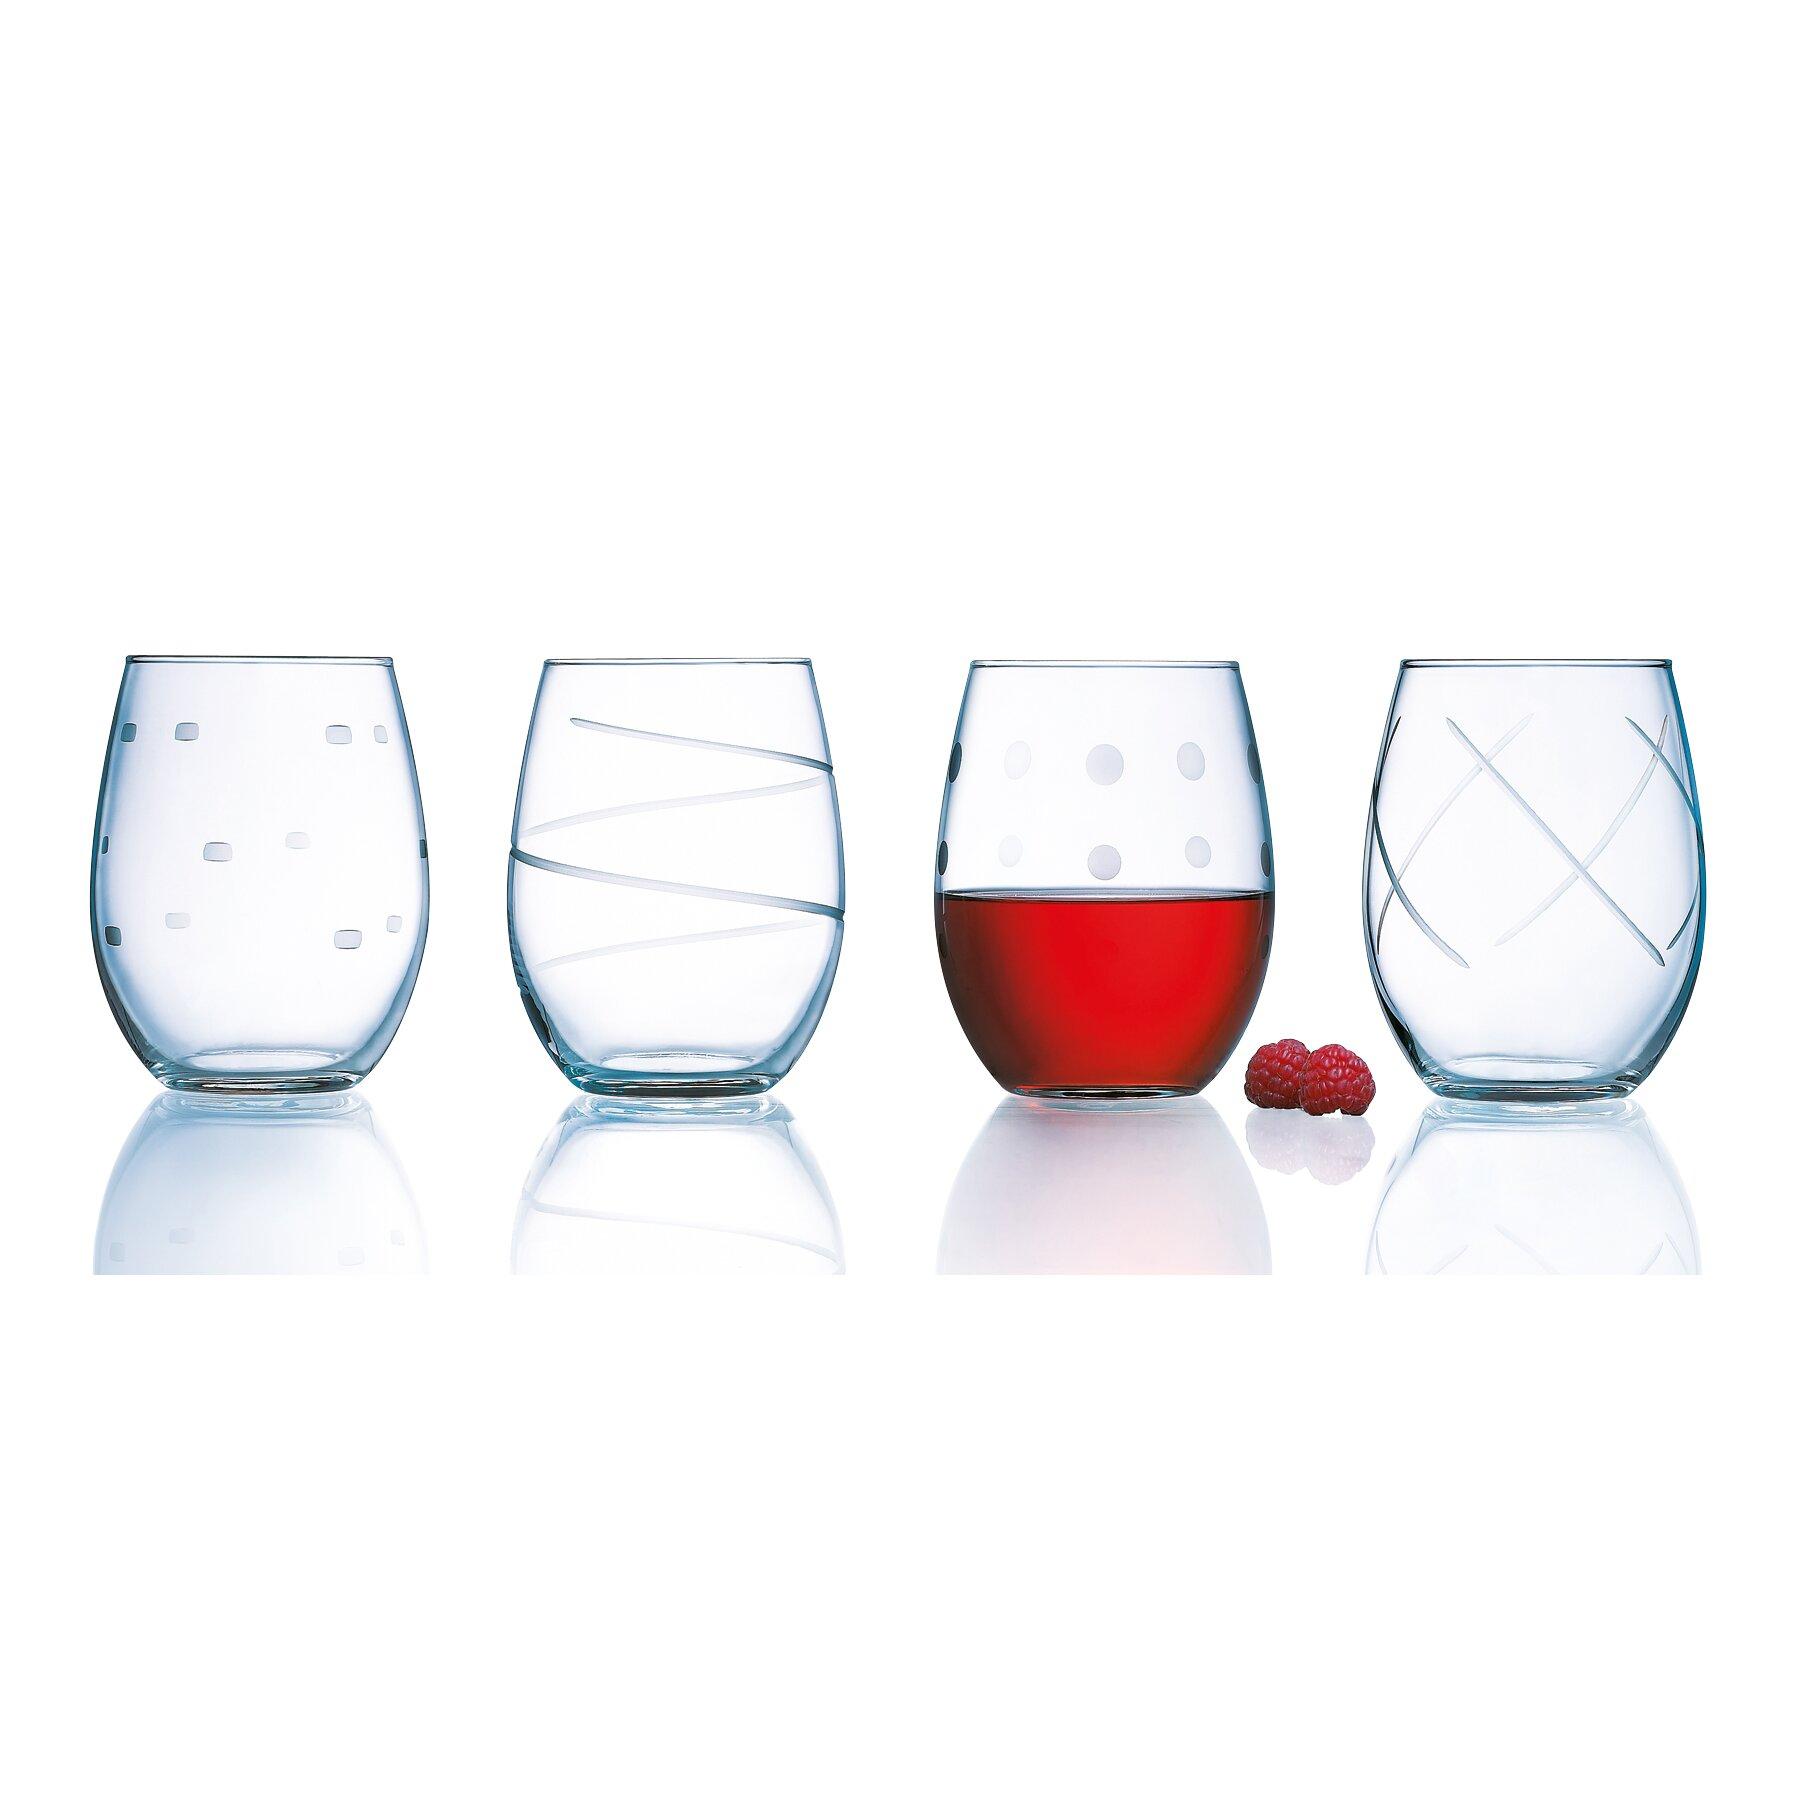 Luminarc Soho 21 Oz. Stemless Wine Glass & Reviews | Wayfair